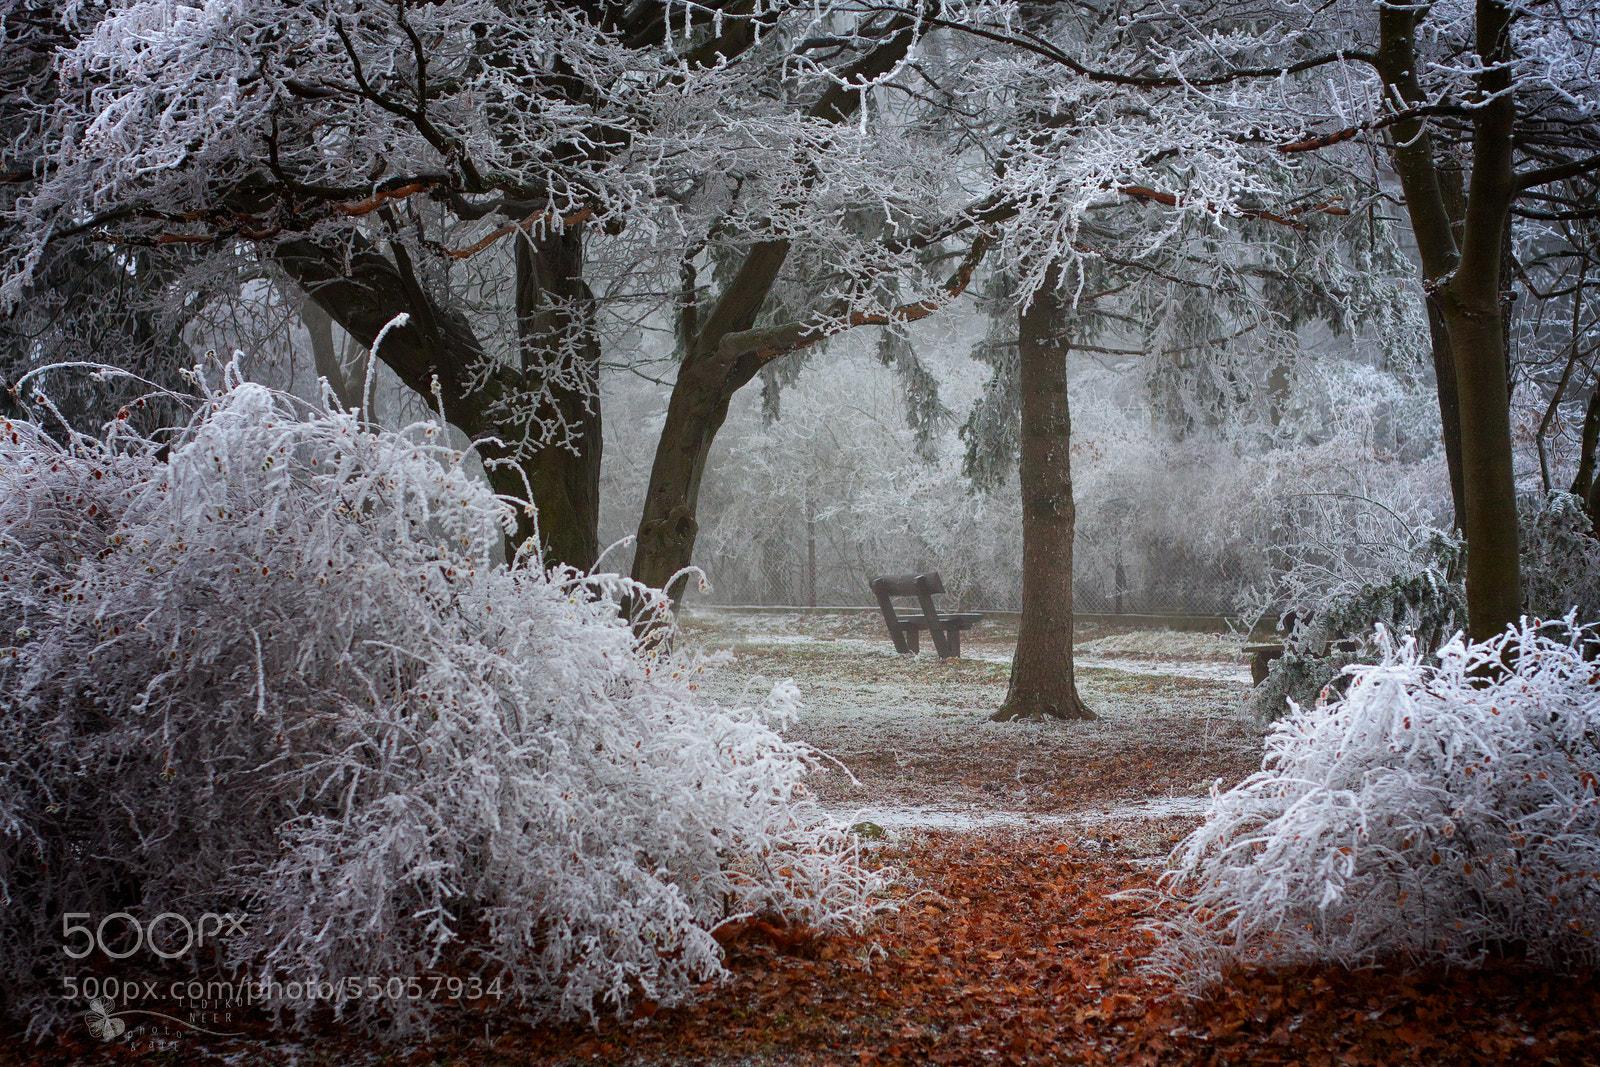 Photograph Winter Wonder by Ildiko Neer on 500px